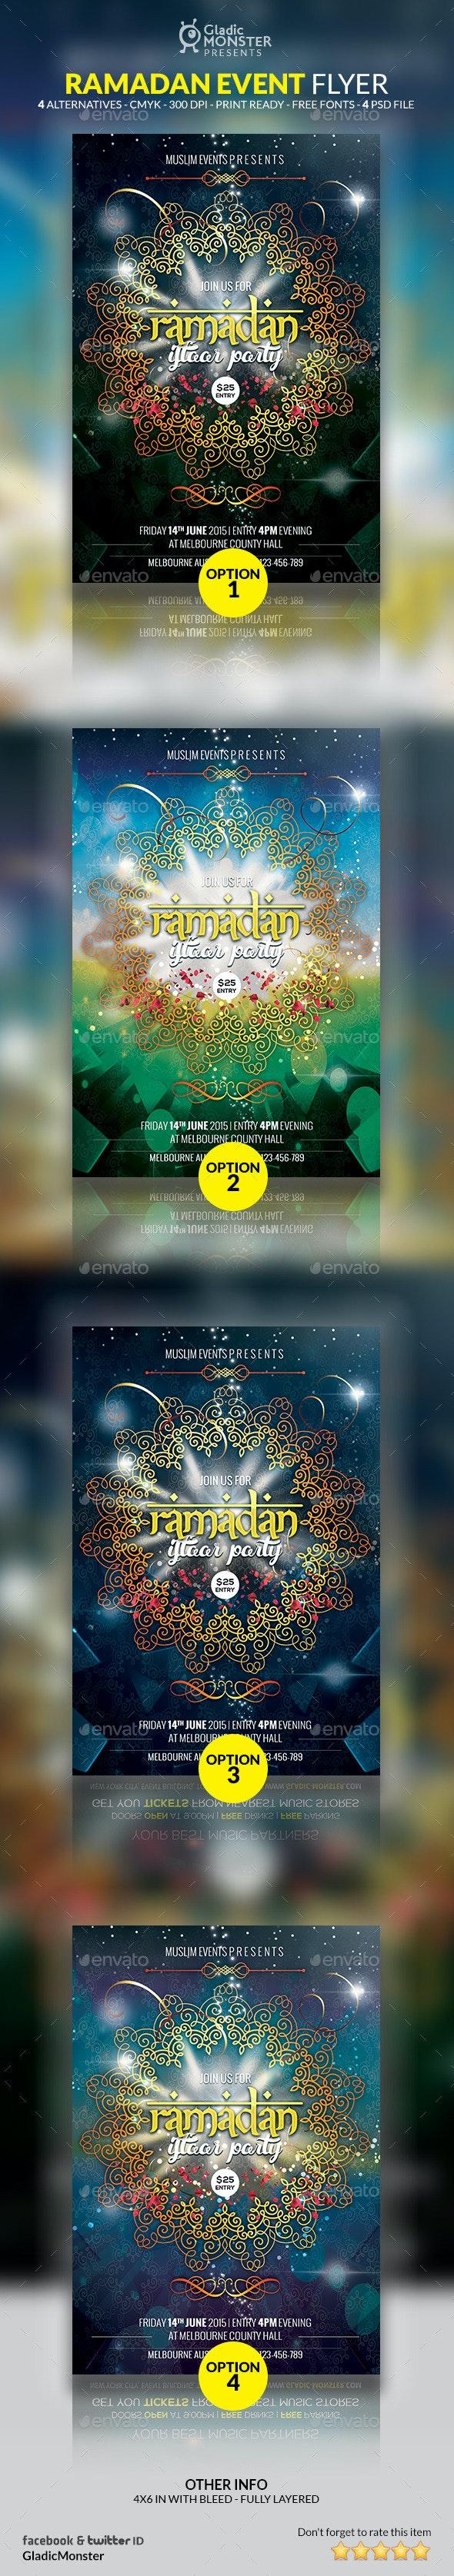 Ramadan Iftaar Party Flyer - Events Flyers